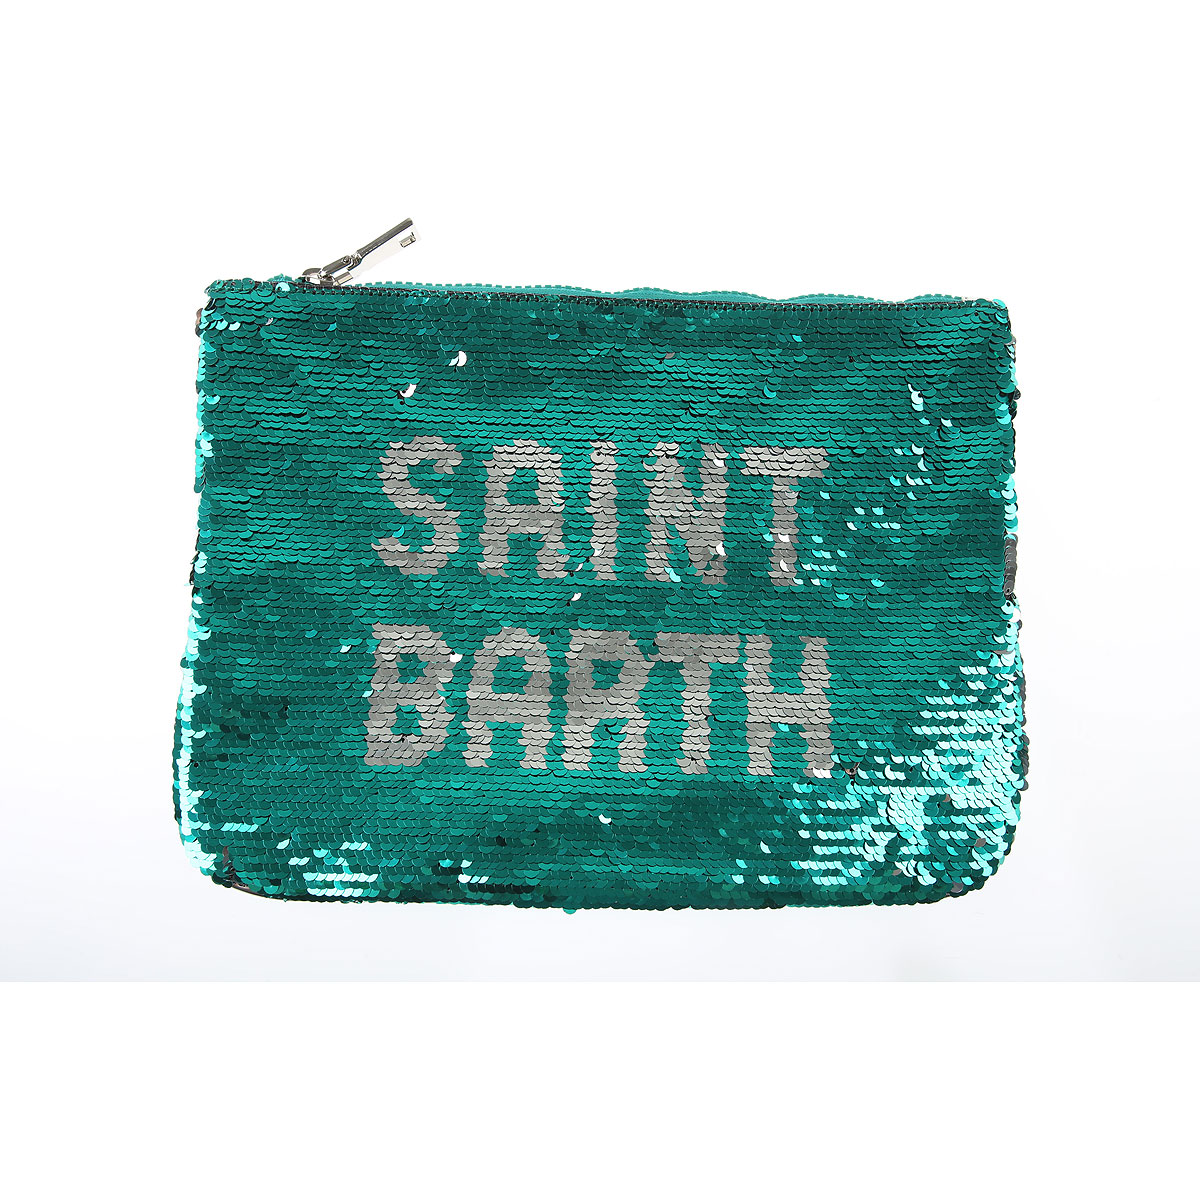 Mc2 Saint Barth Pochette Clutch, Vert, Polyester, 2019